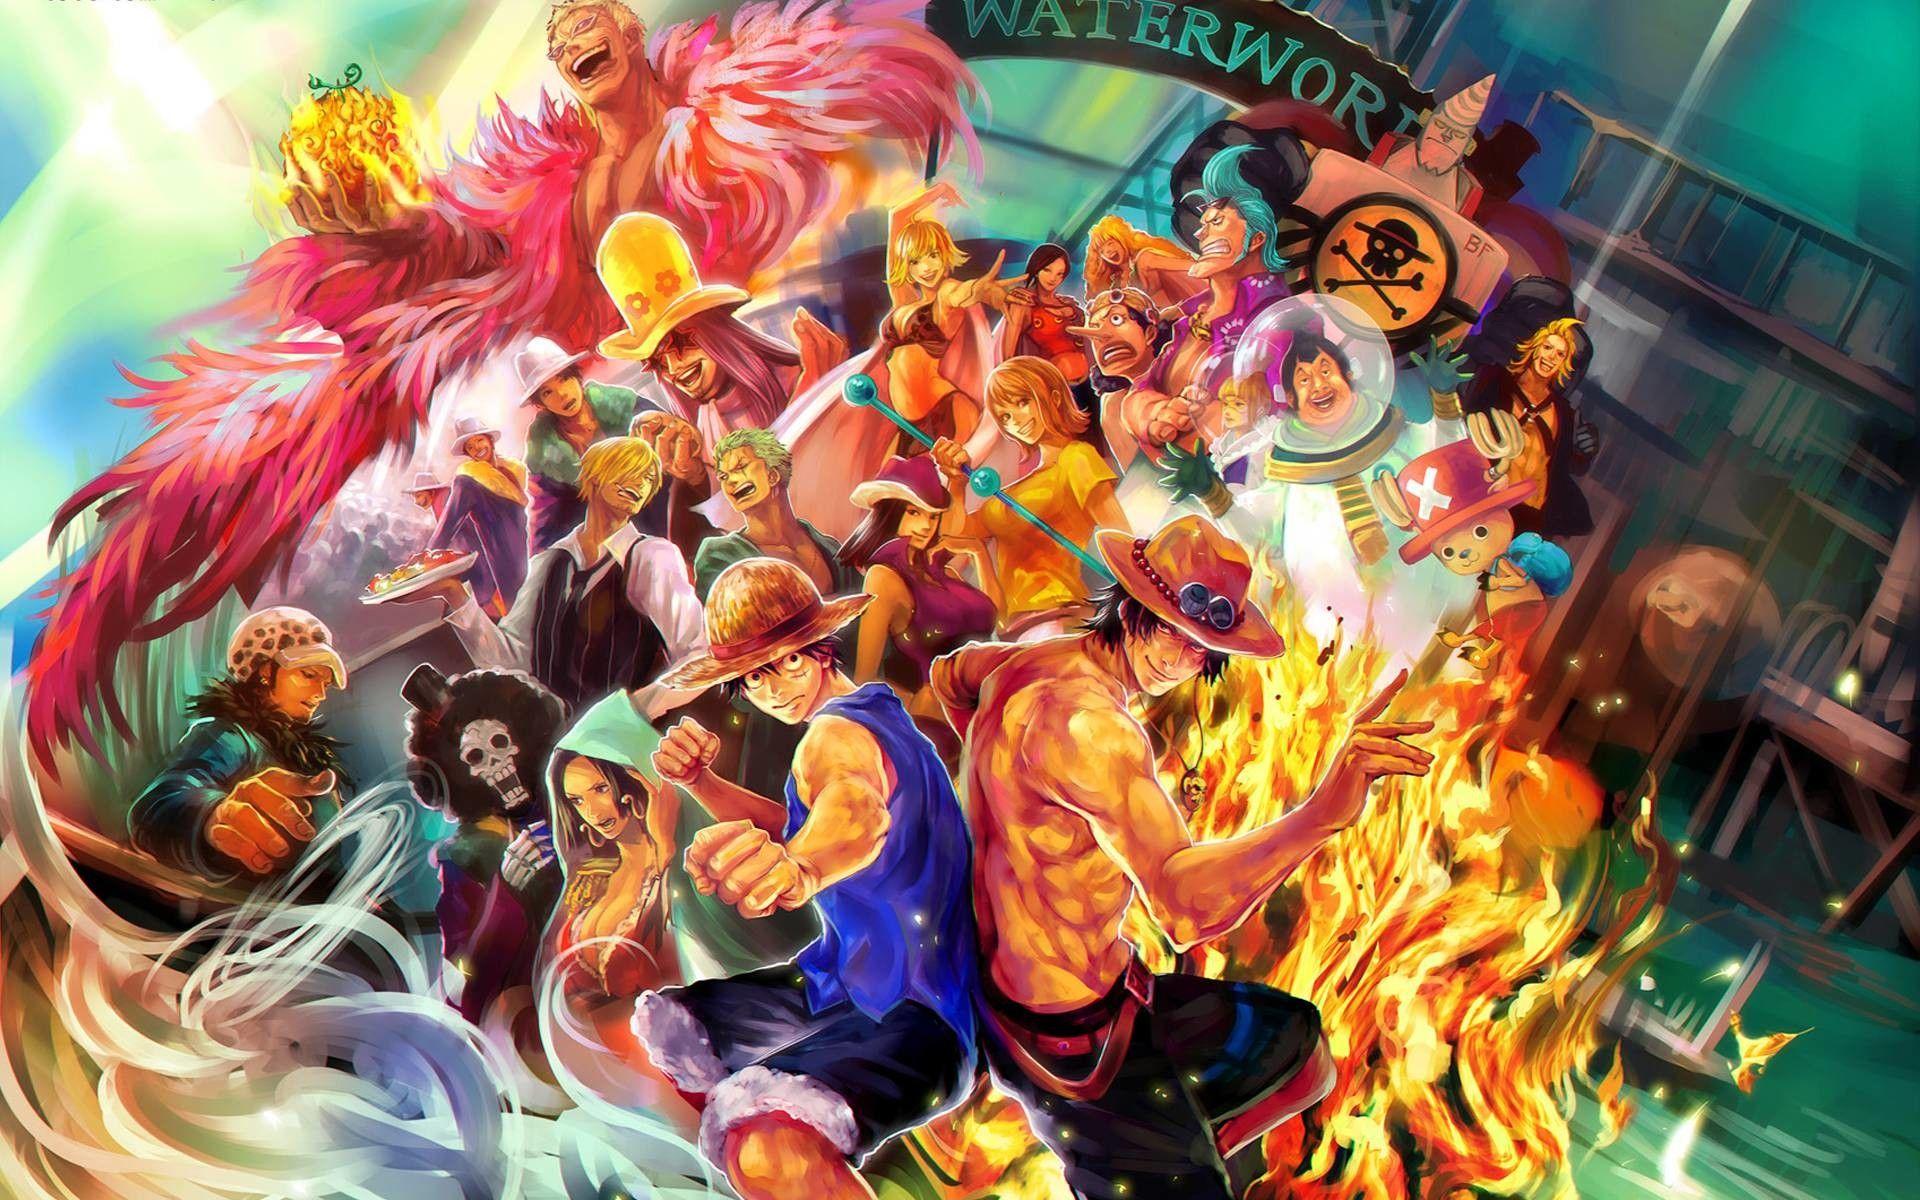 Iphone Ultra Hd One Piece Wallpaper Doraemon Animasi Wallpaper Anime Poster Cetak